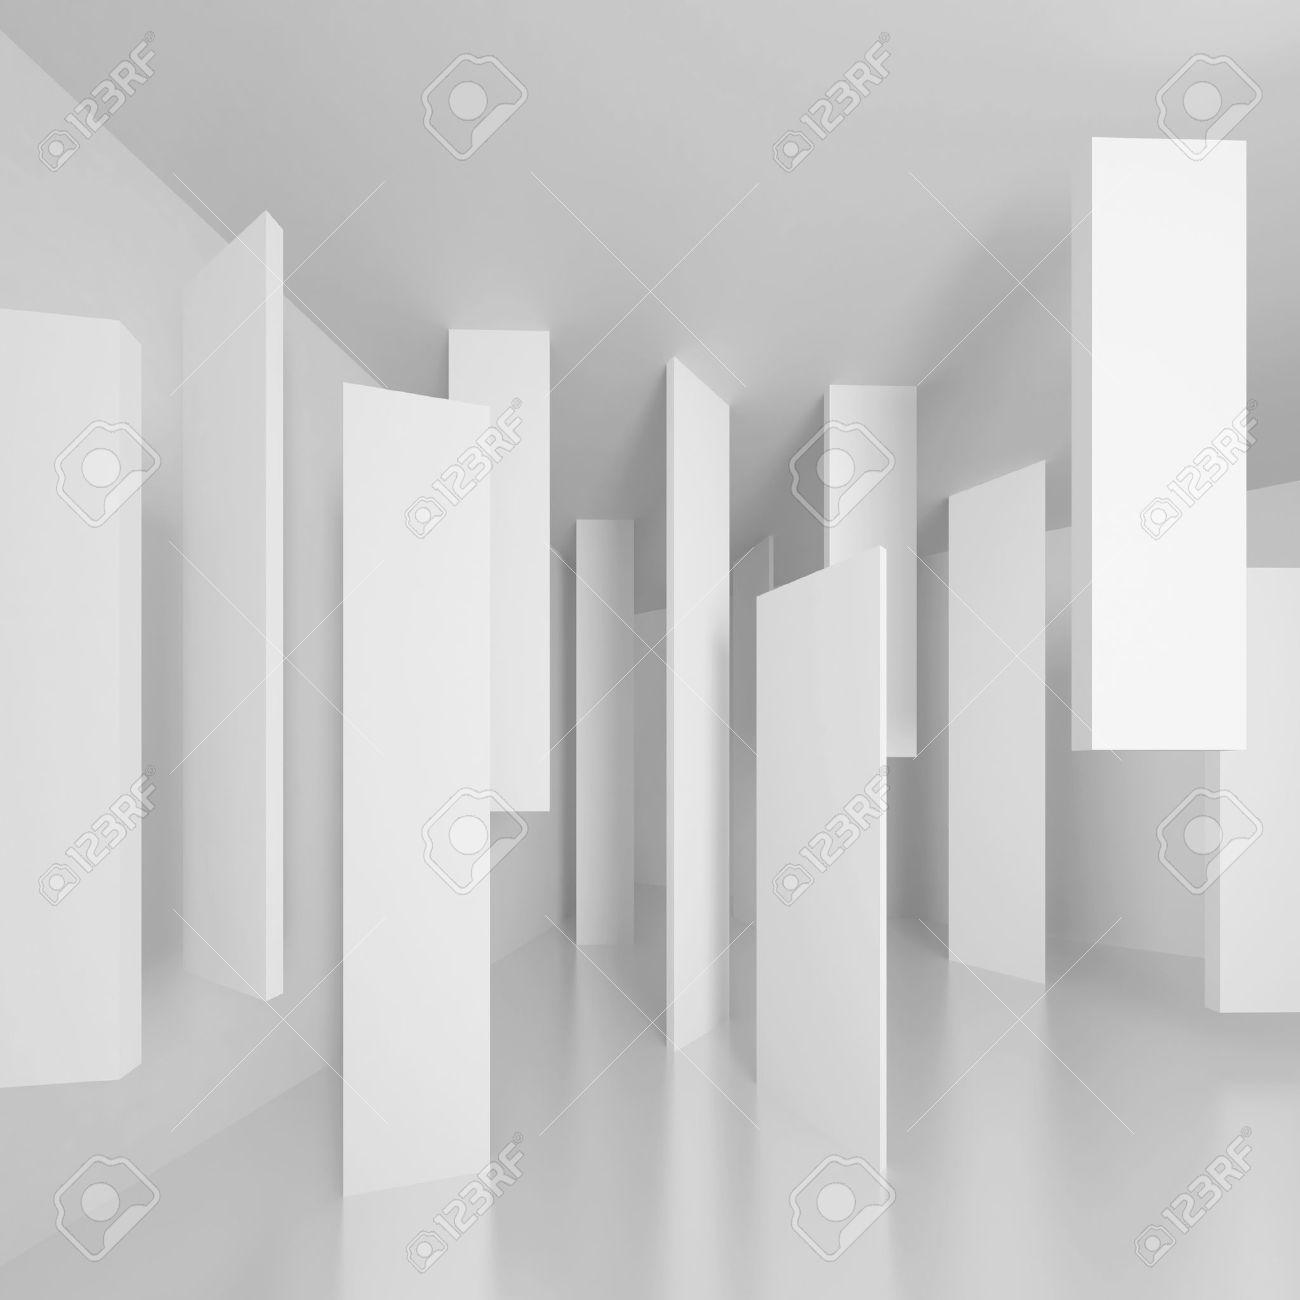 Architecture Design Background